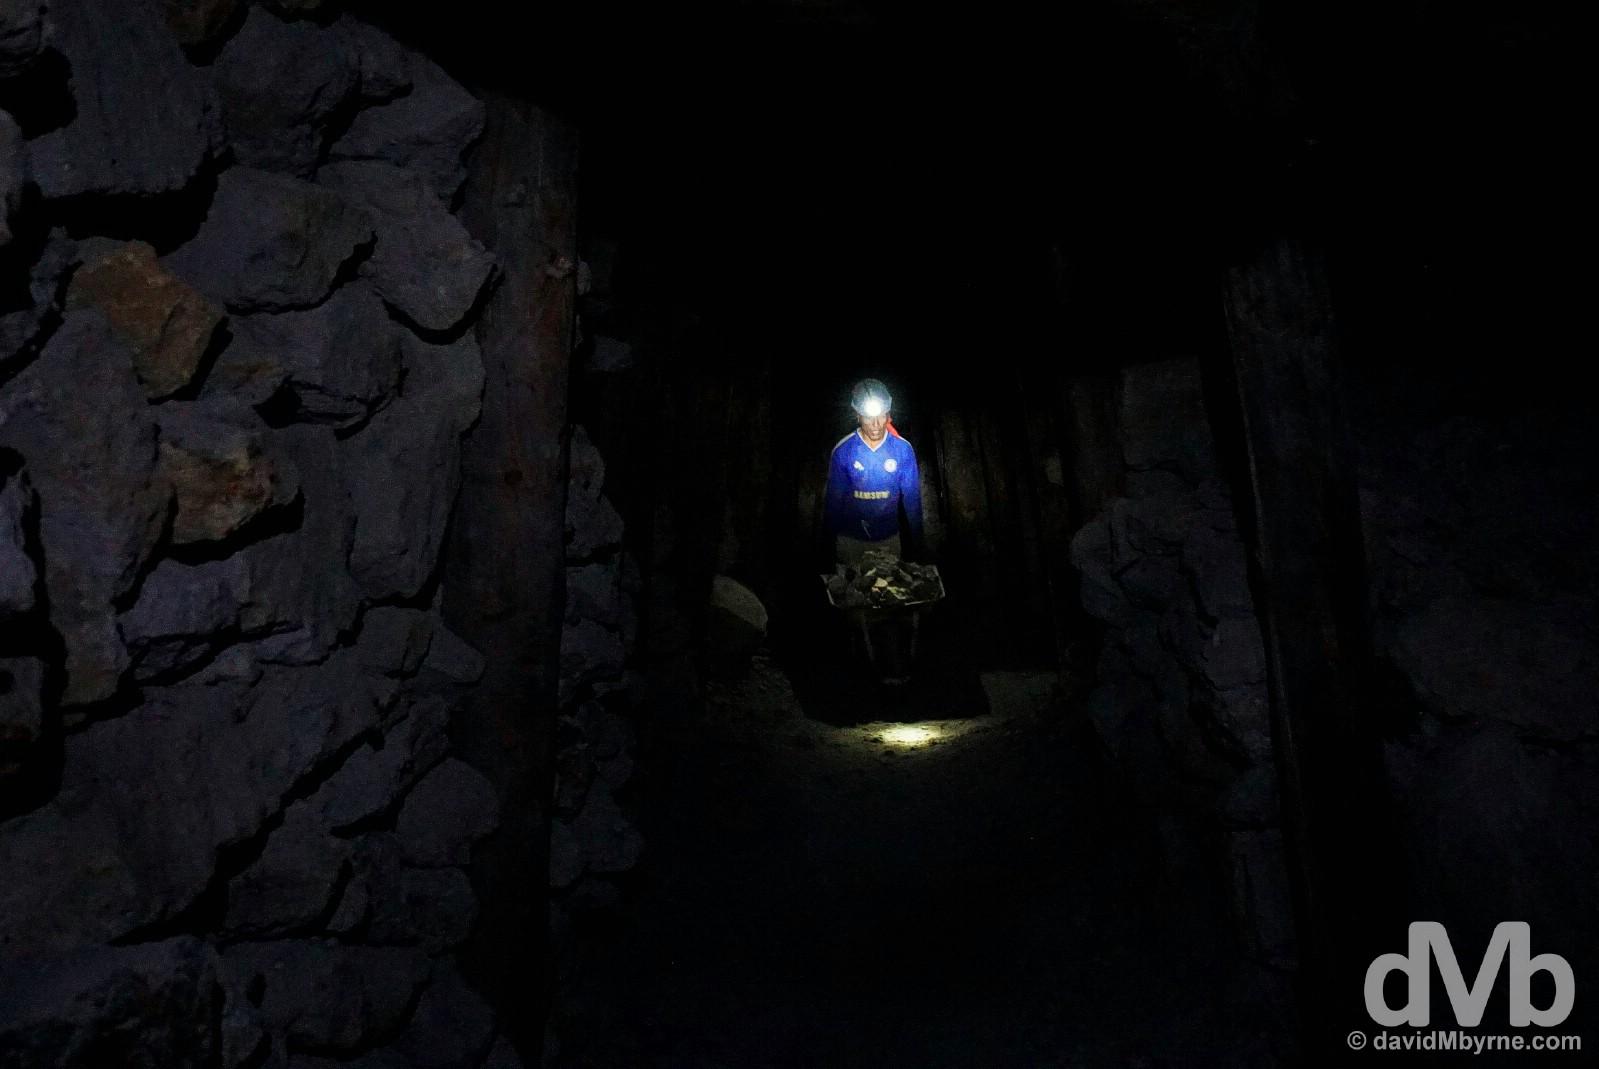 In the deep, dark mineral mines of Cerro Rico, Potosi, Bolivia. September 1, 2015.